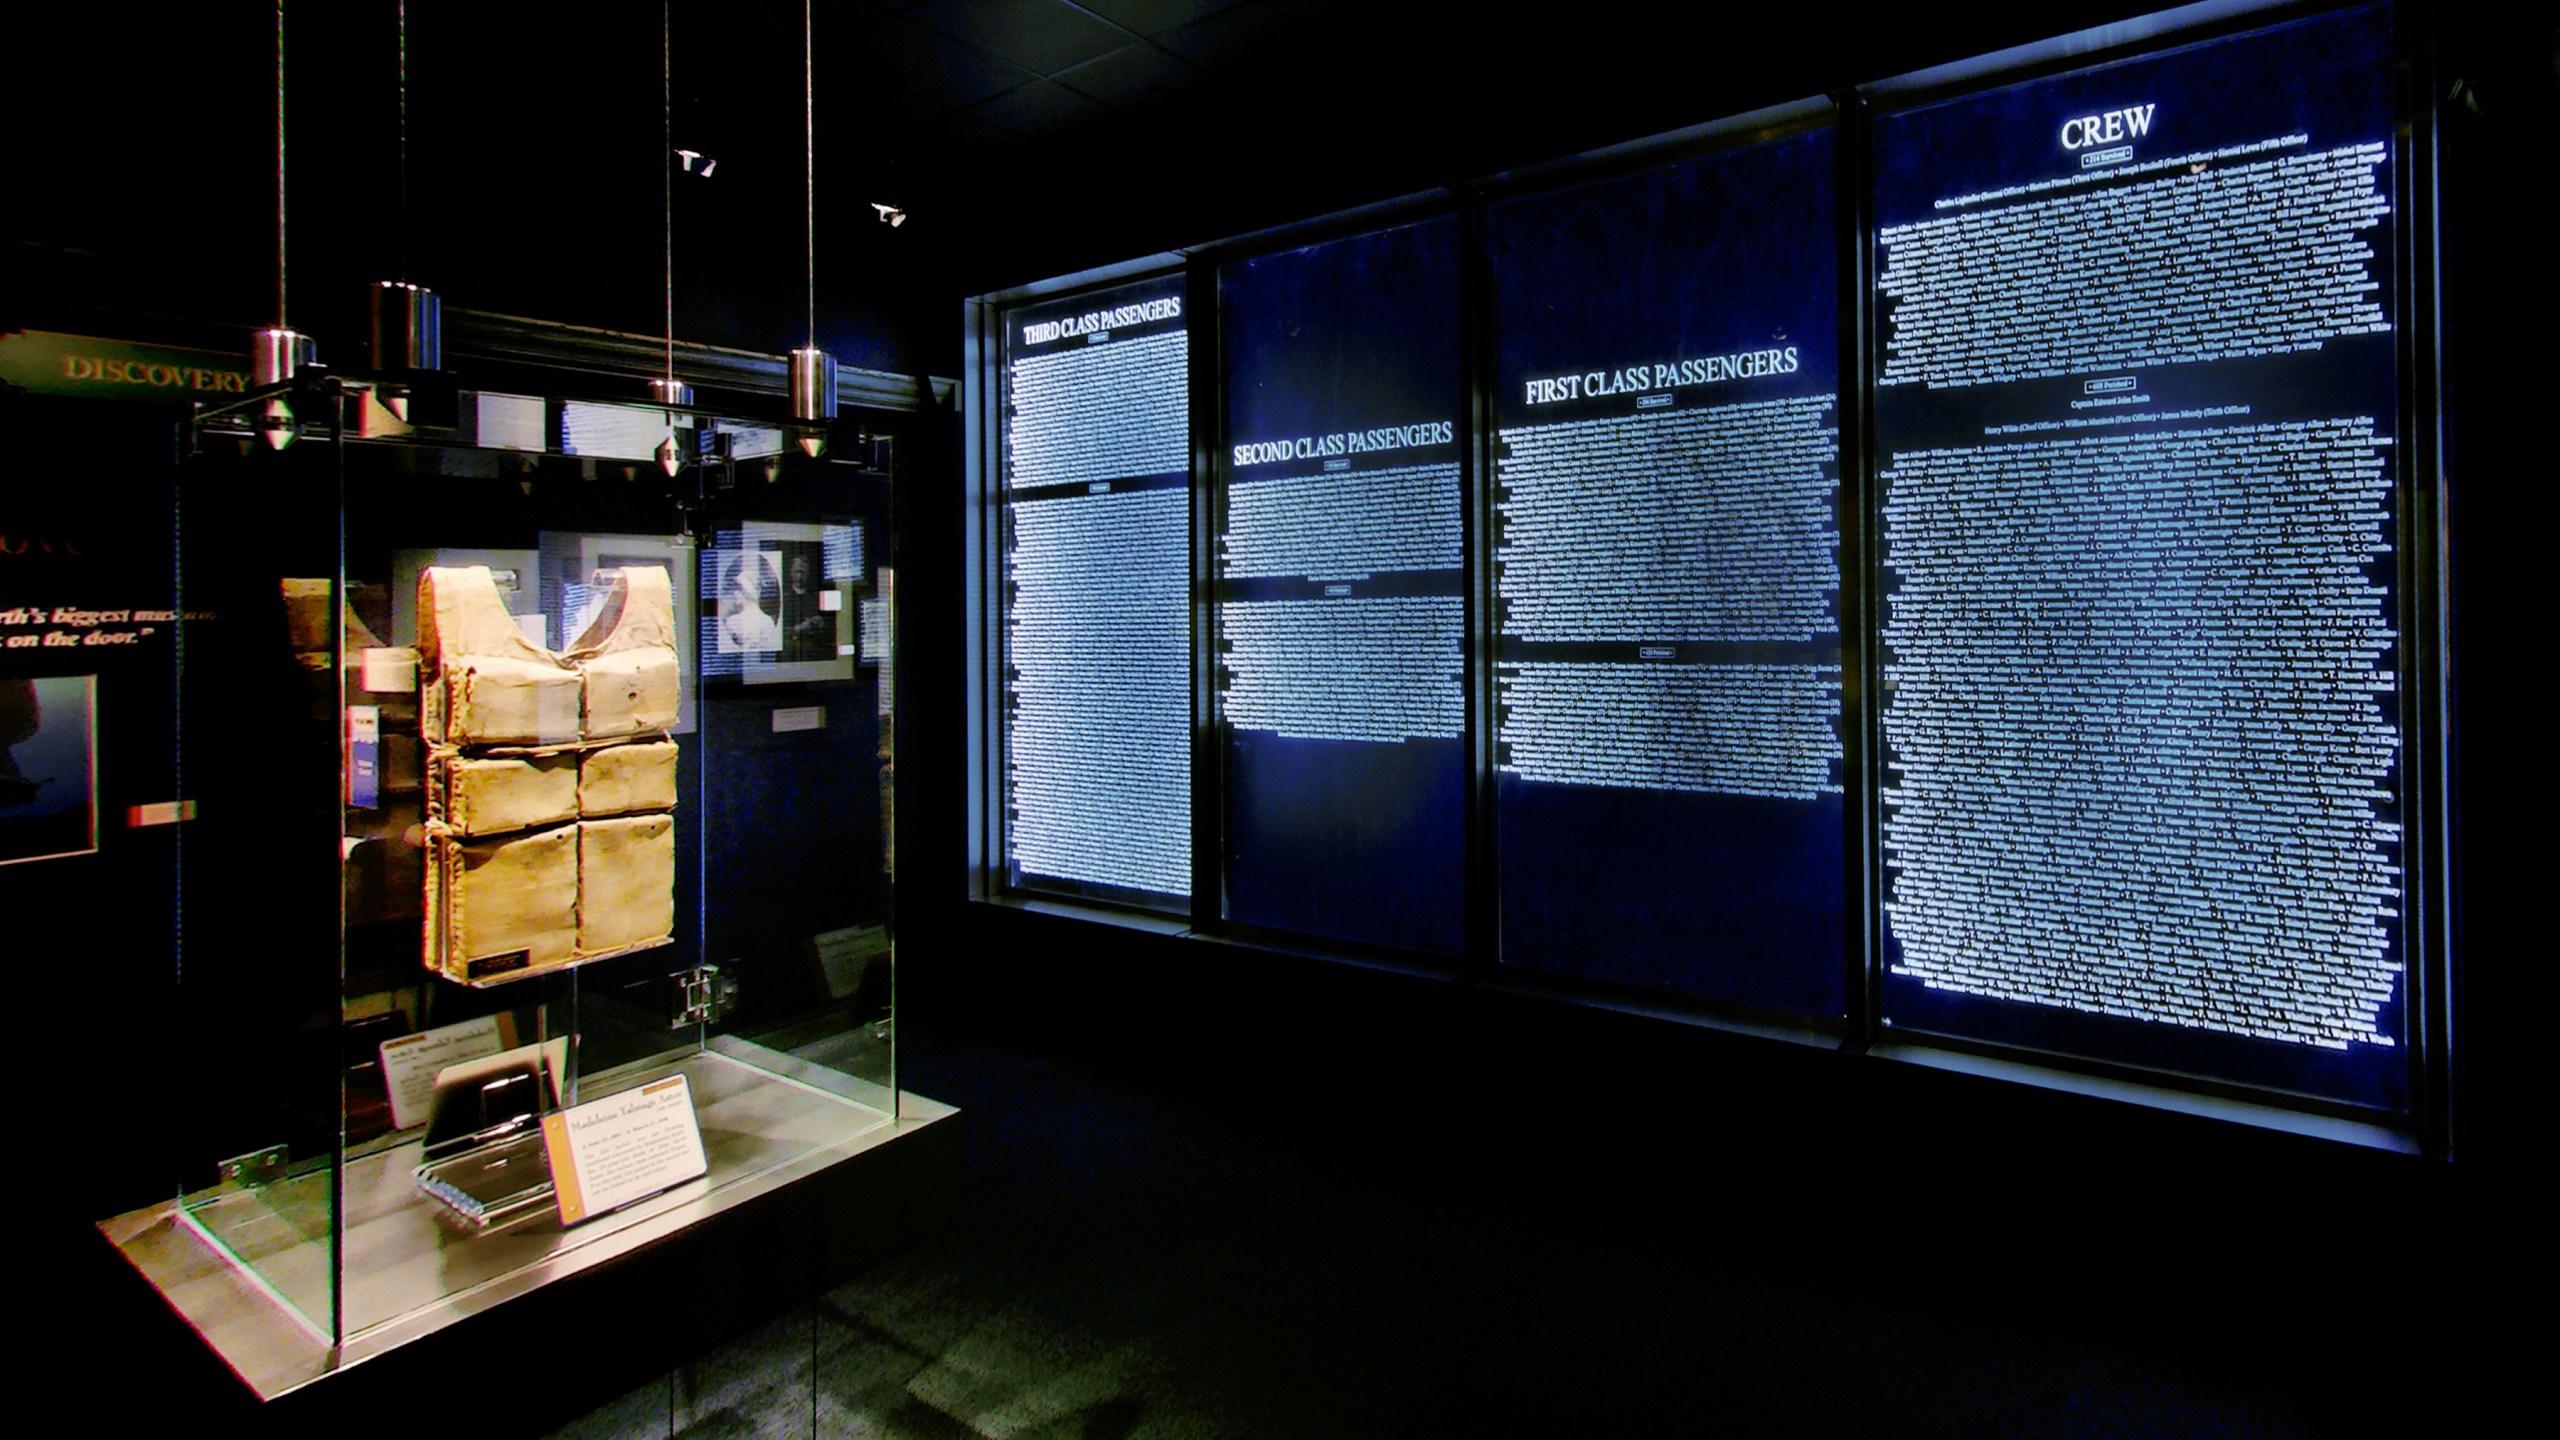 titanic-pigeon-forge-interior13_1560340188875.jpg